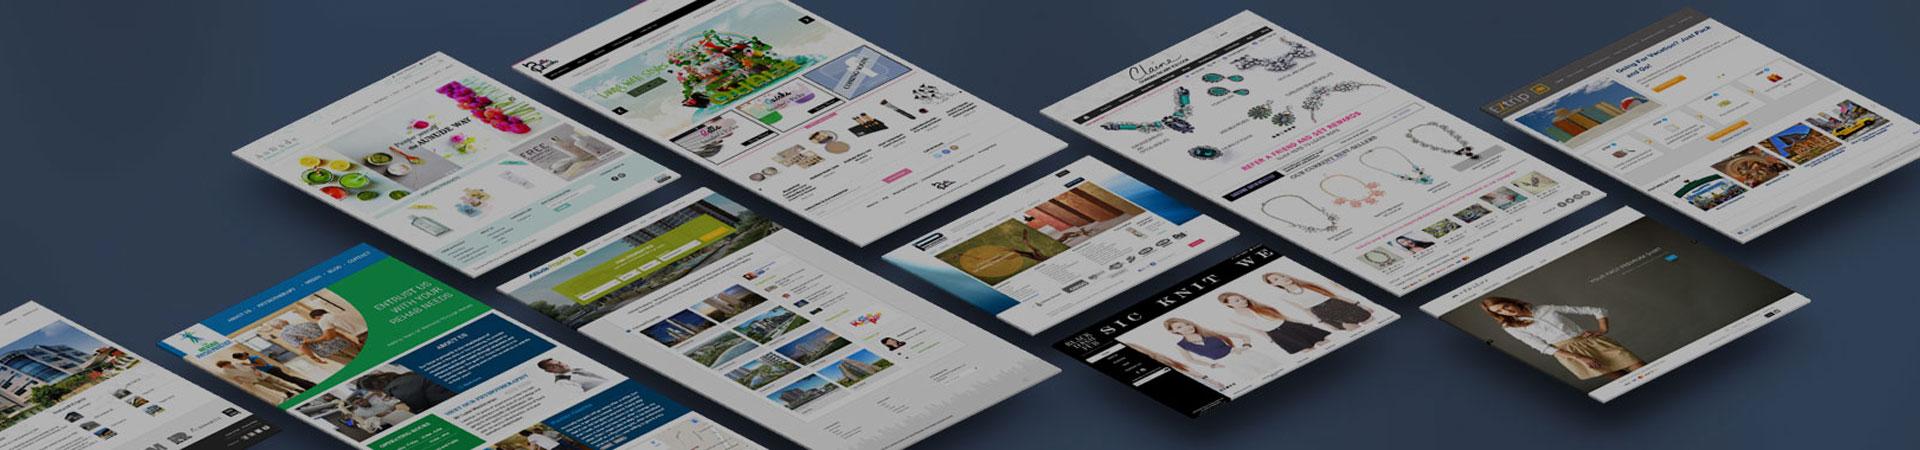 Website Design Singapore - The Penny Shop